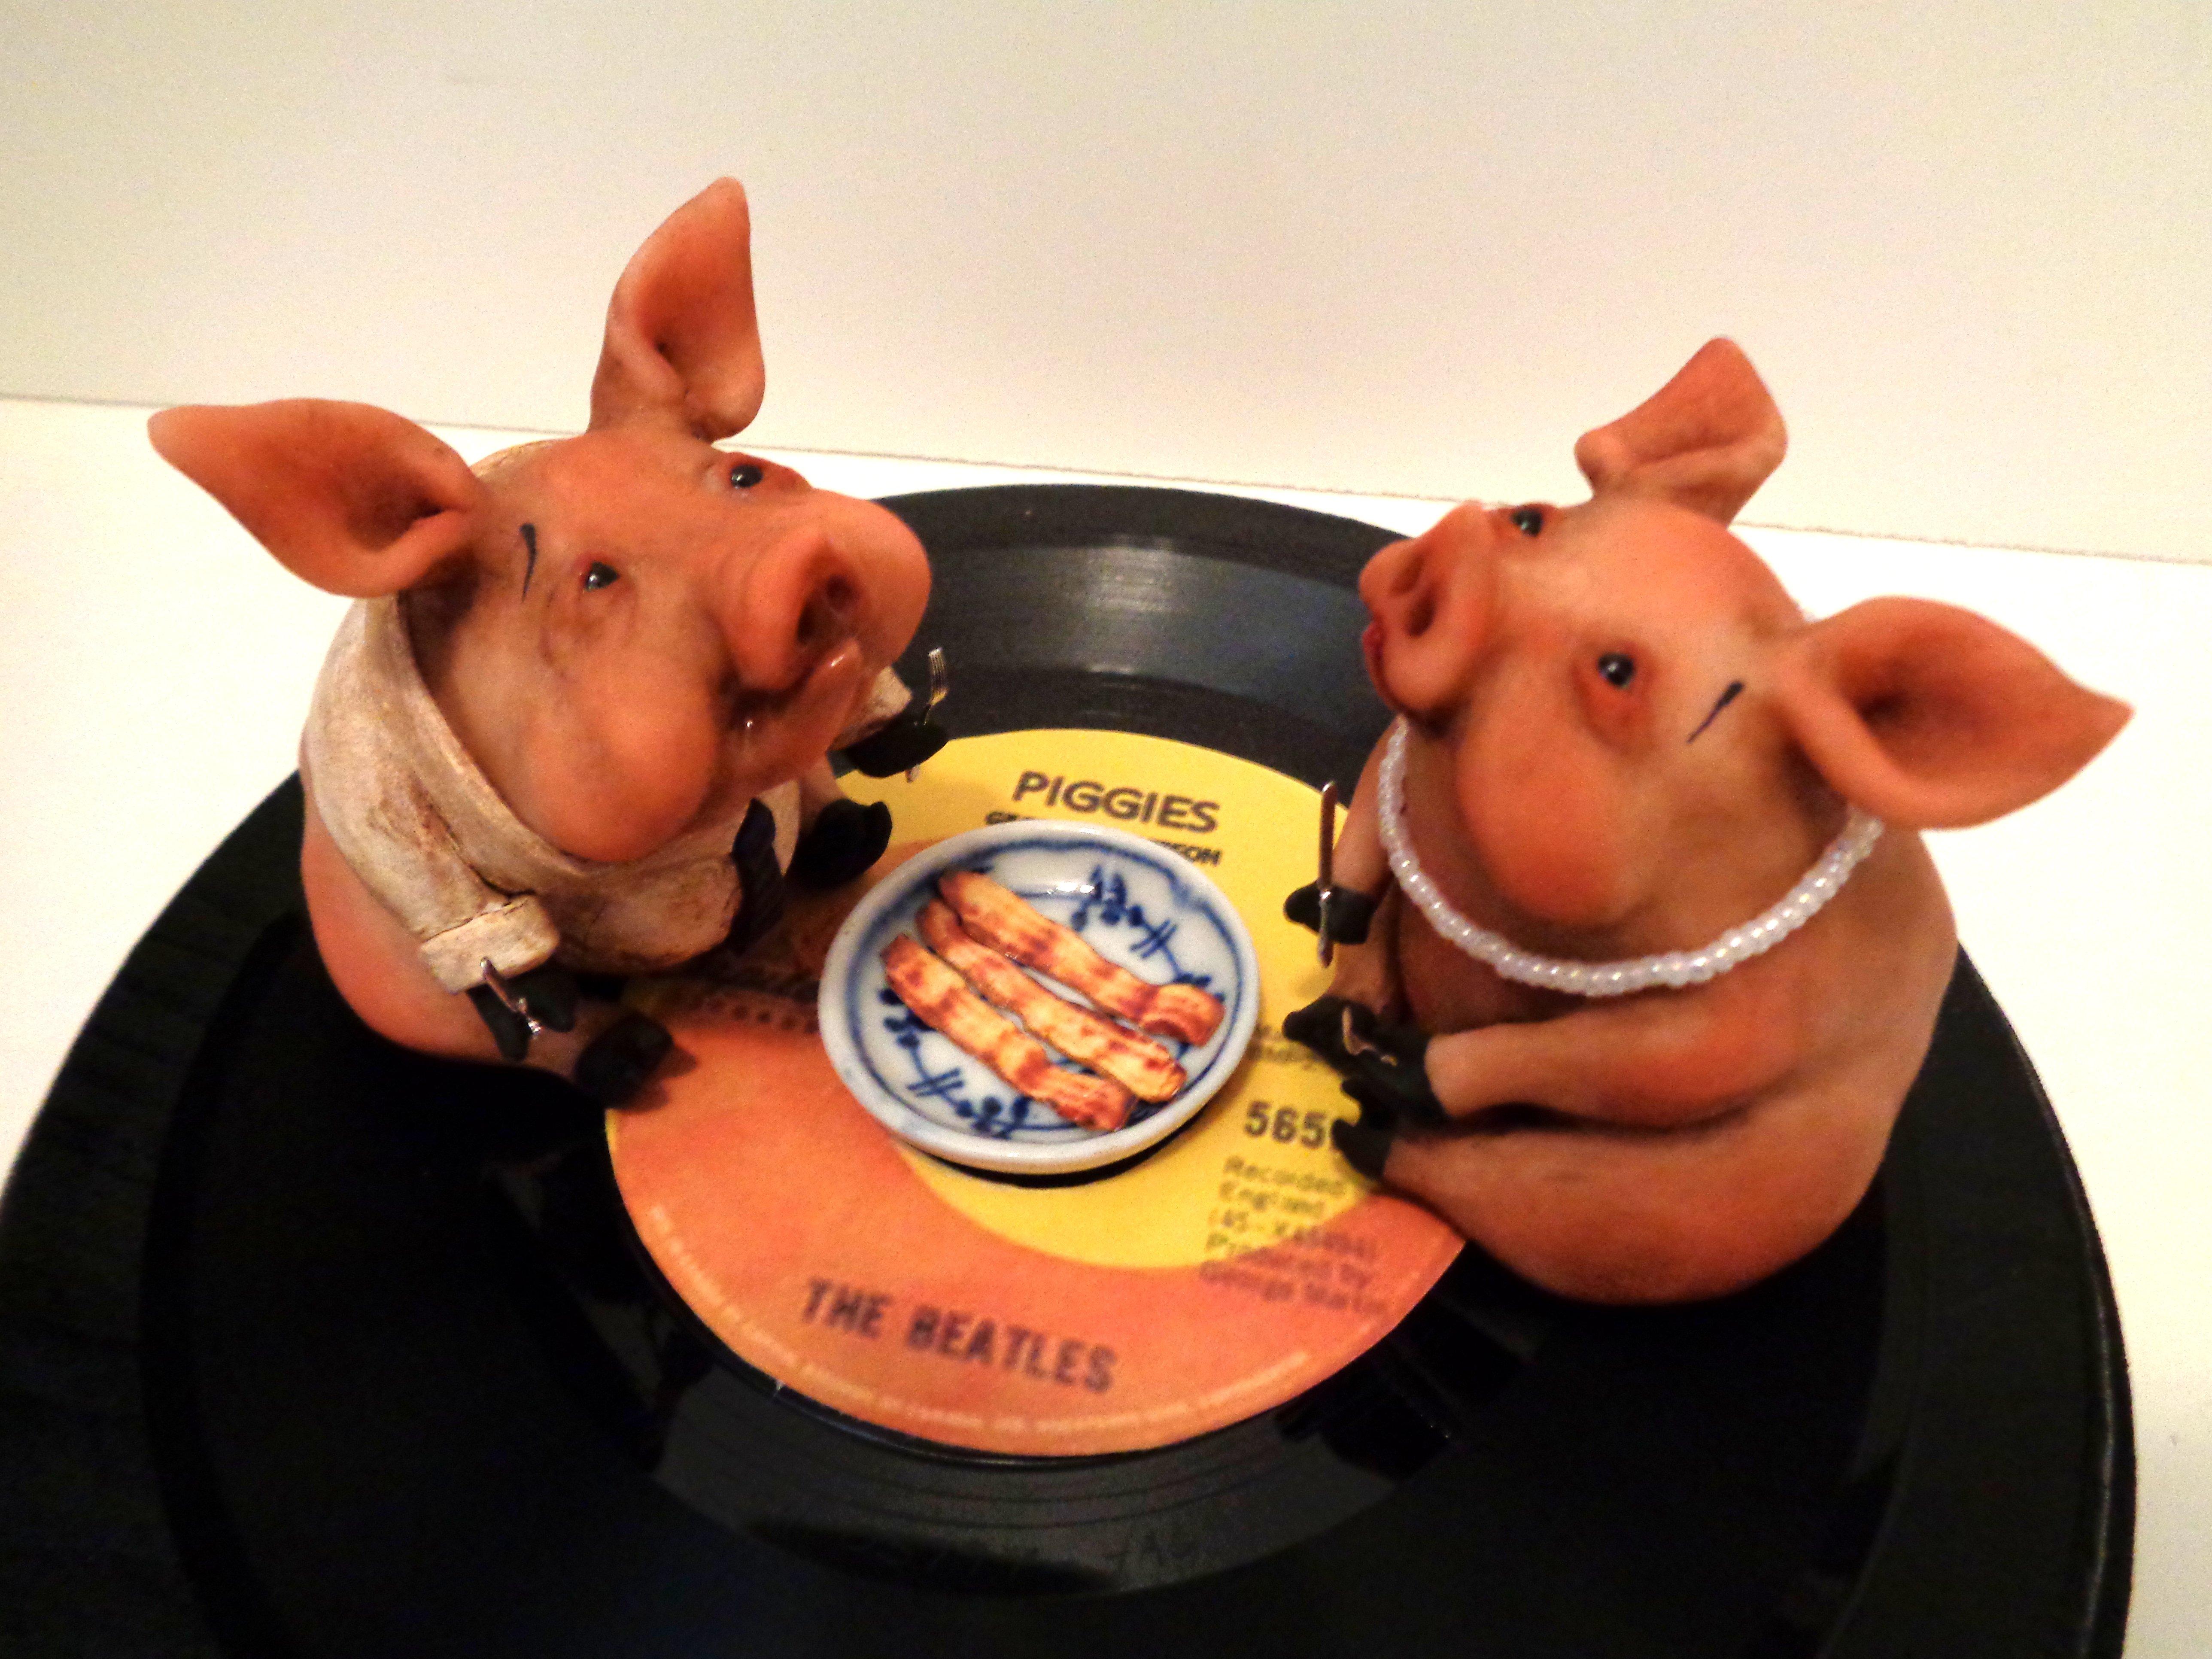 Piggies - detail A - Denise Bledsoe